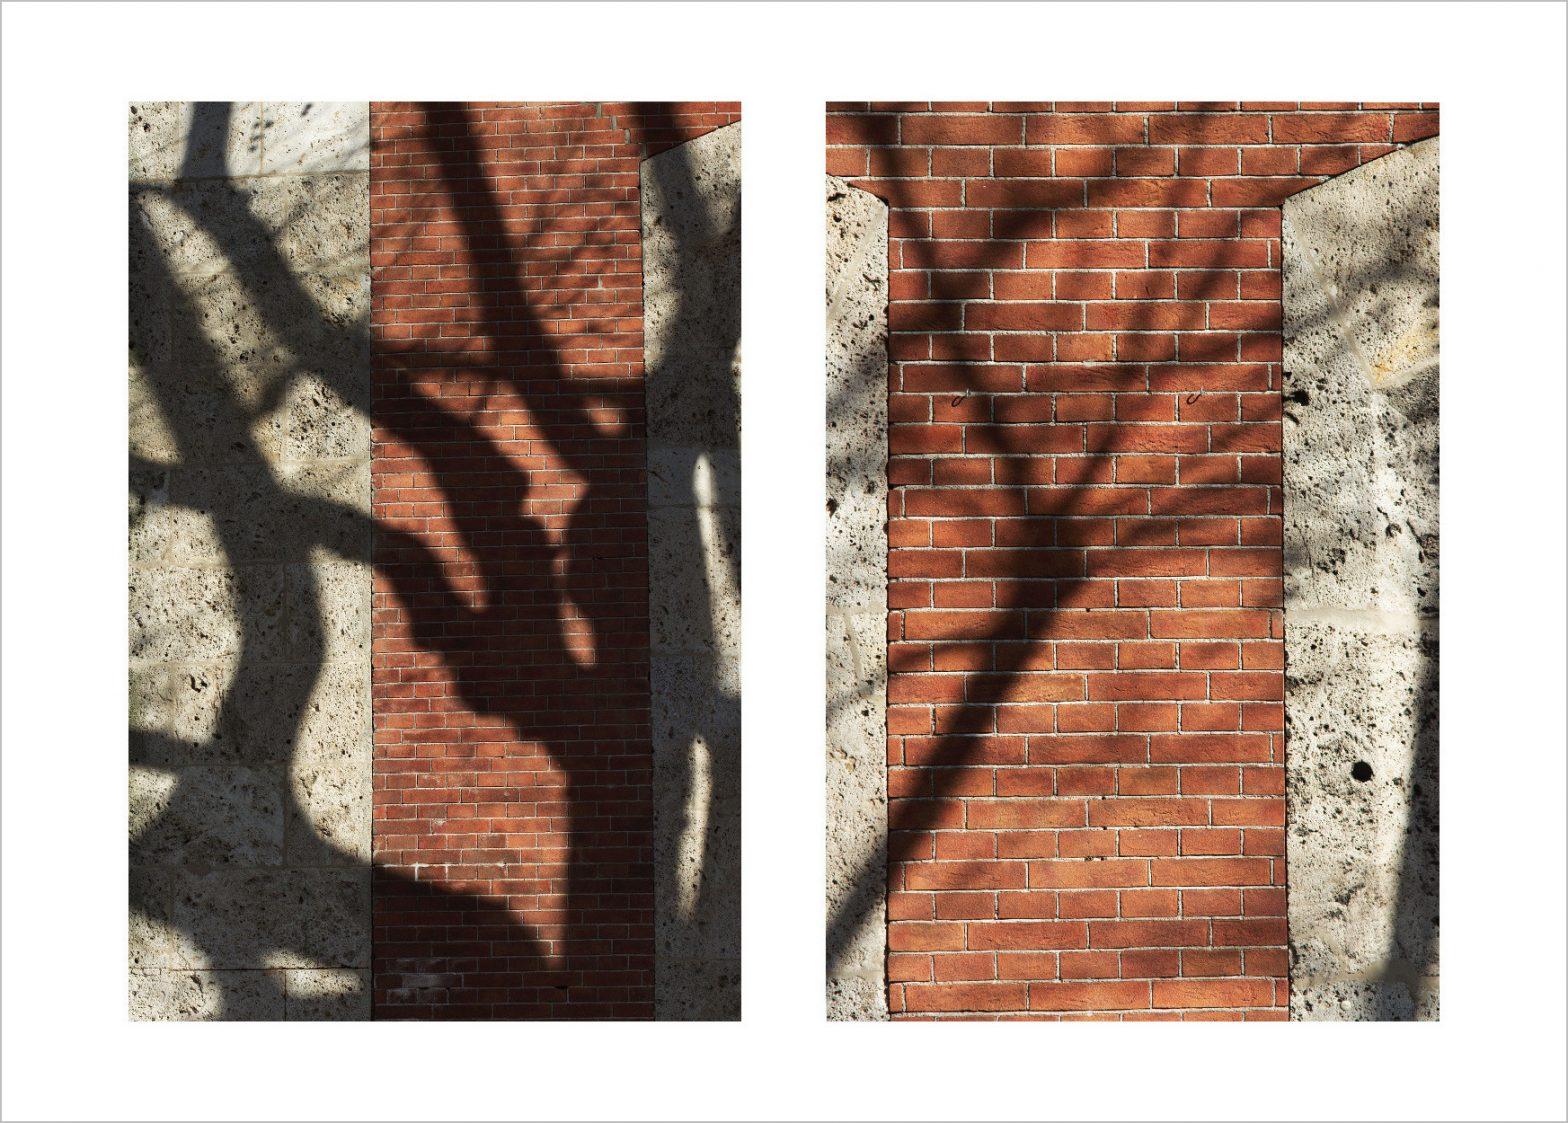 Trees Shadows on Old Saline Building, Bad Reichenhall